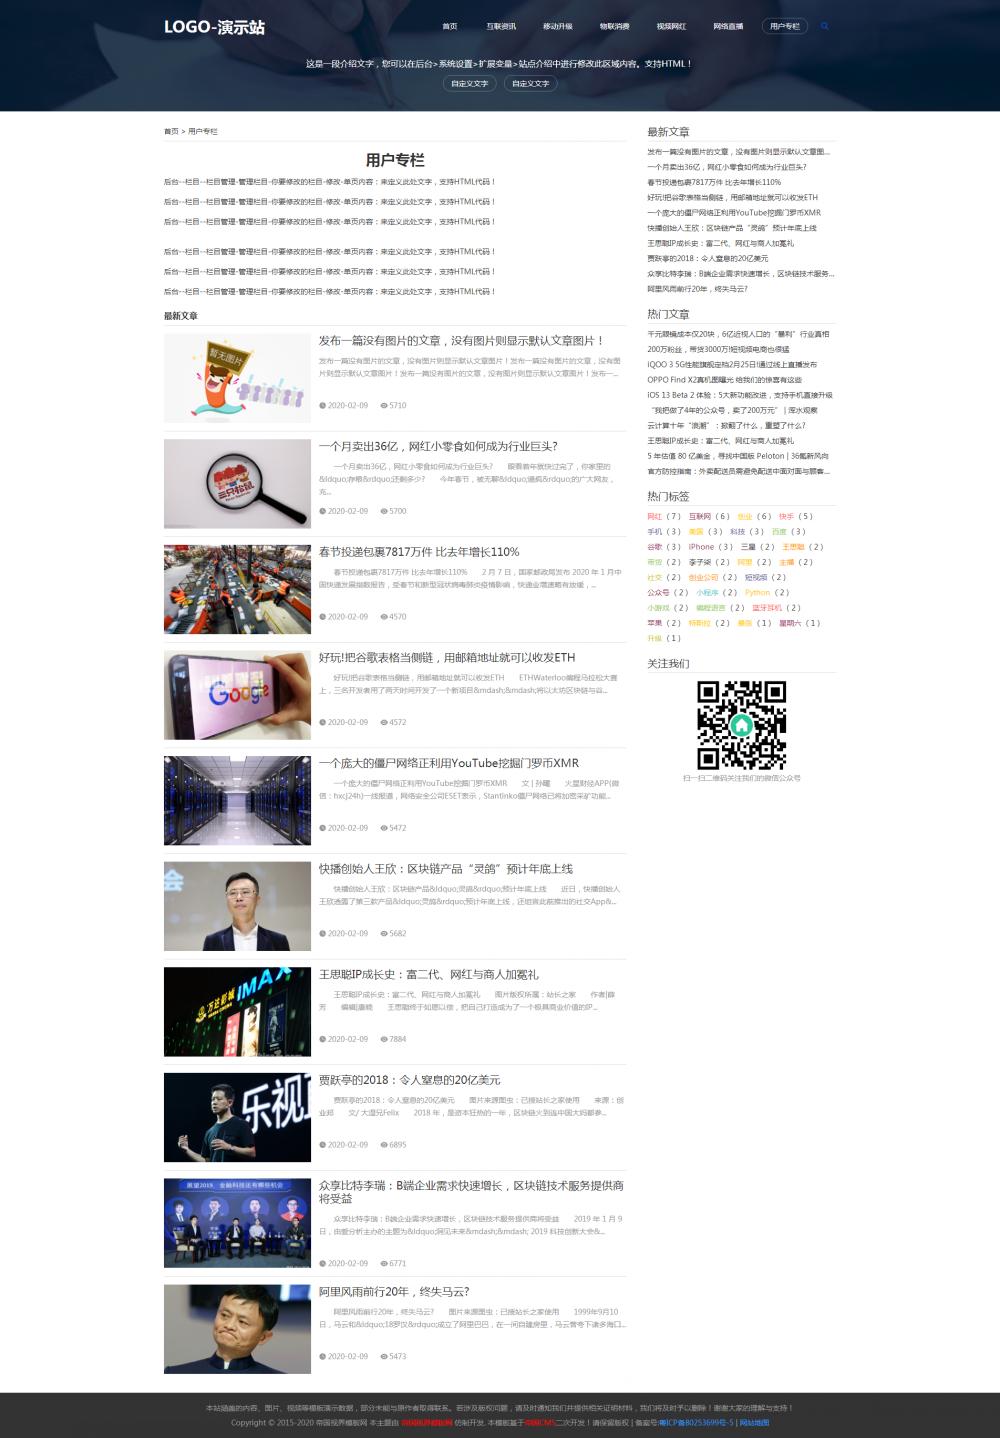 [DG-095]帝国CMS响应式博客模板,自适应新闻资讯个人文章博客模板 [DG-095]帝国CMS响应式博客模板,自适应新闻资讯个人文章博客模板 博客文章 第3张